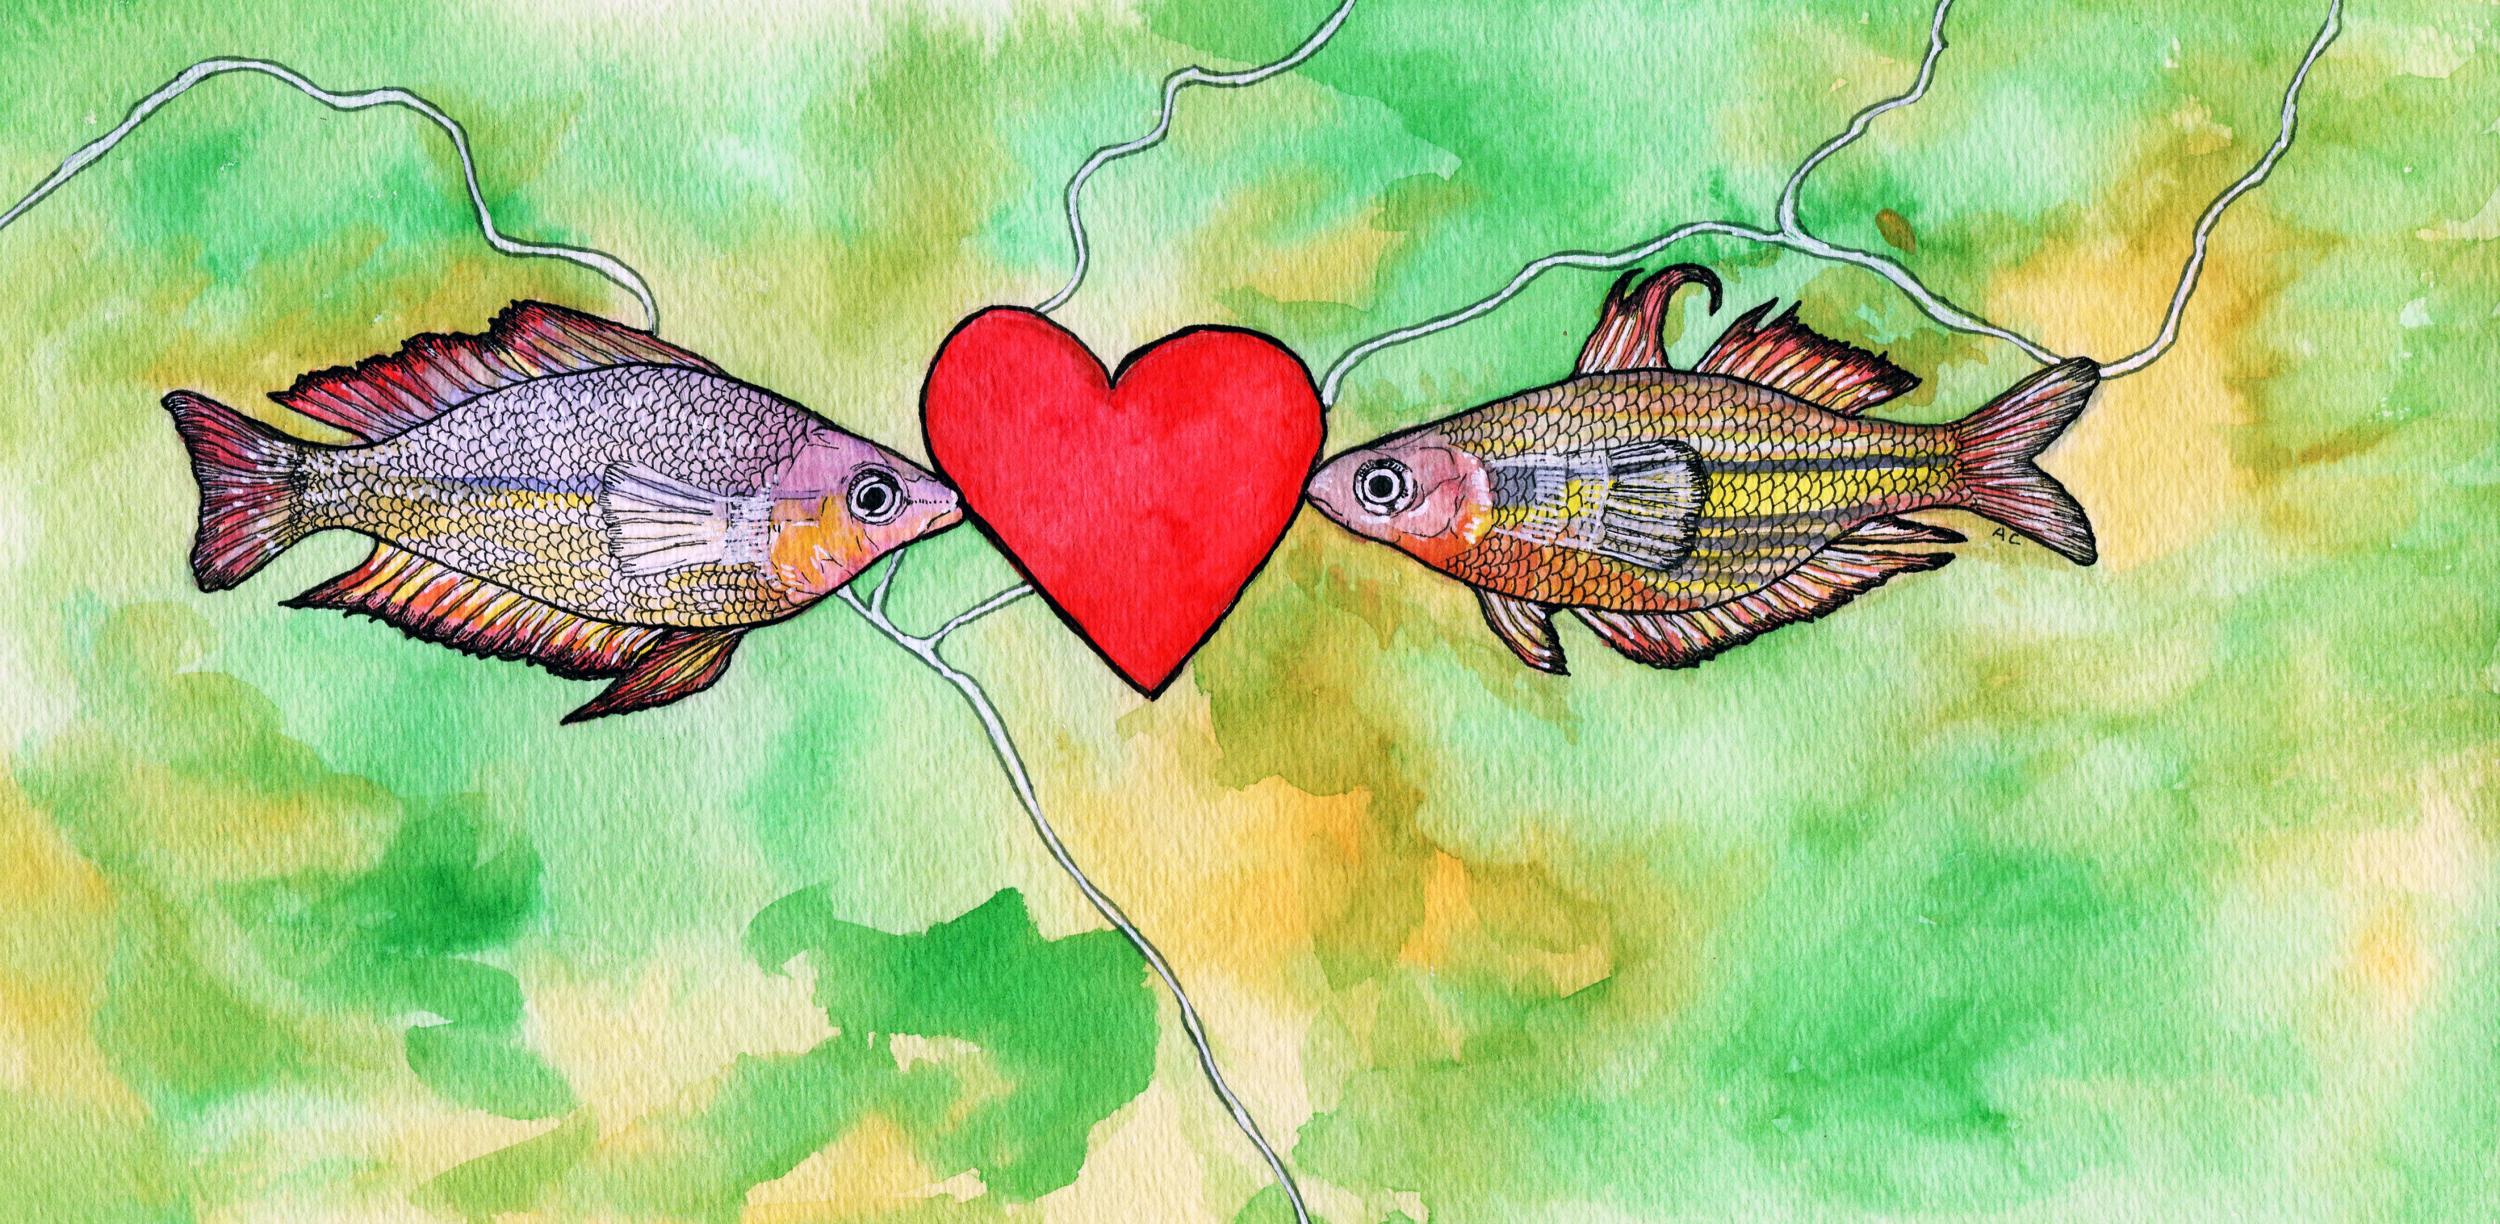 Illustration by  Arpita Choudhury